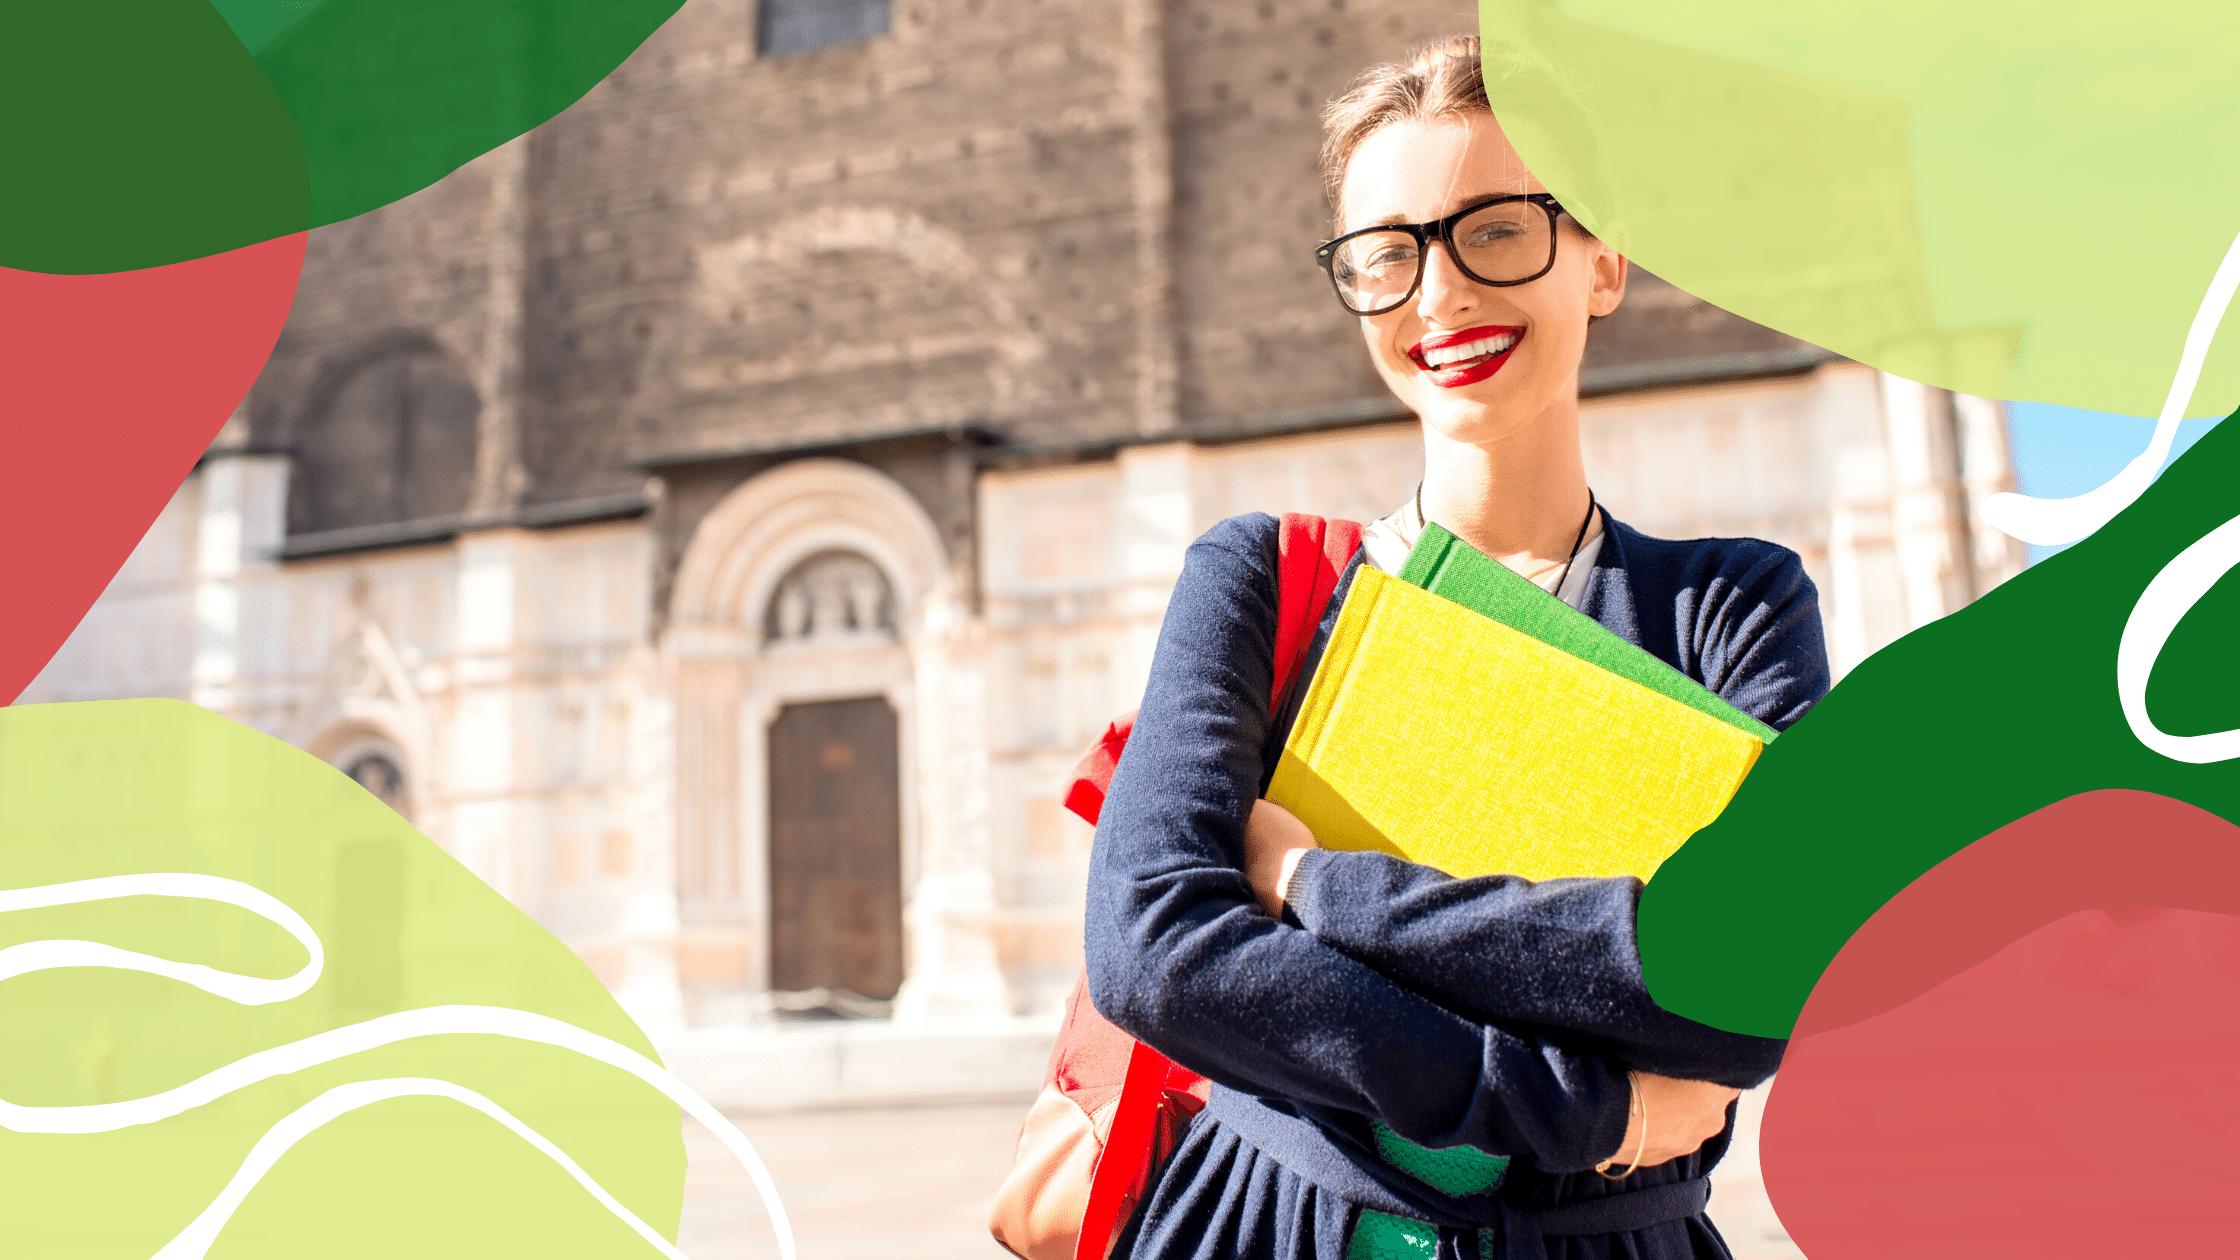 Enroling in Italian university